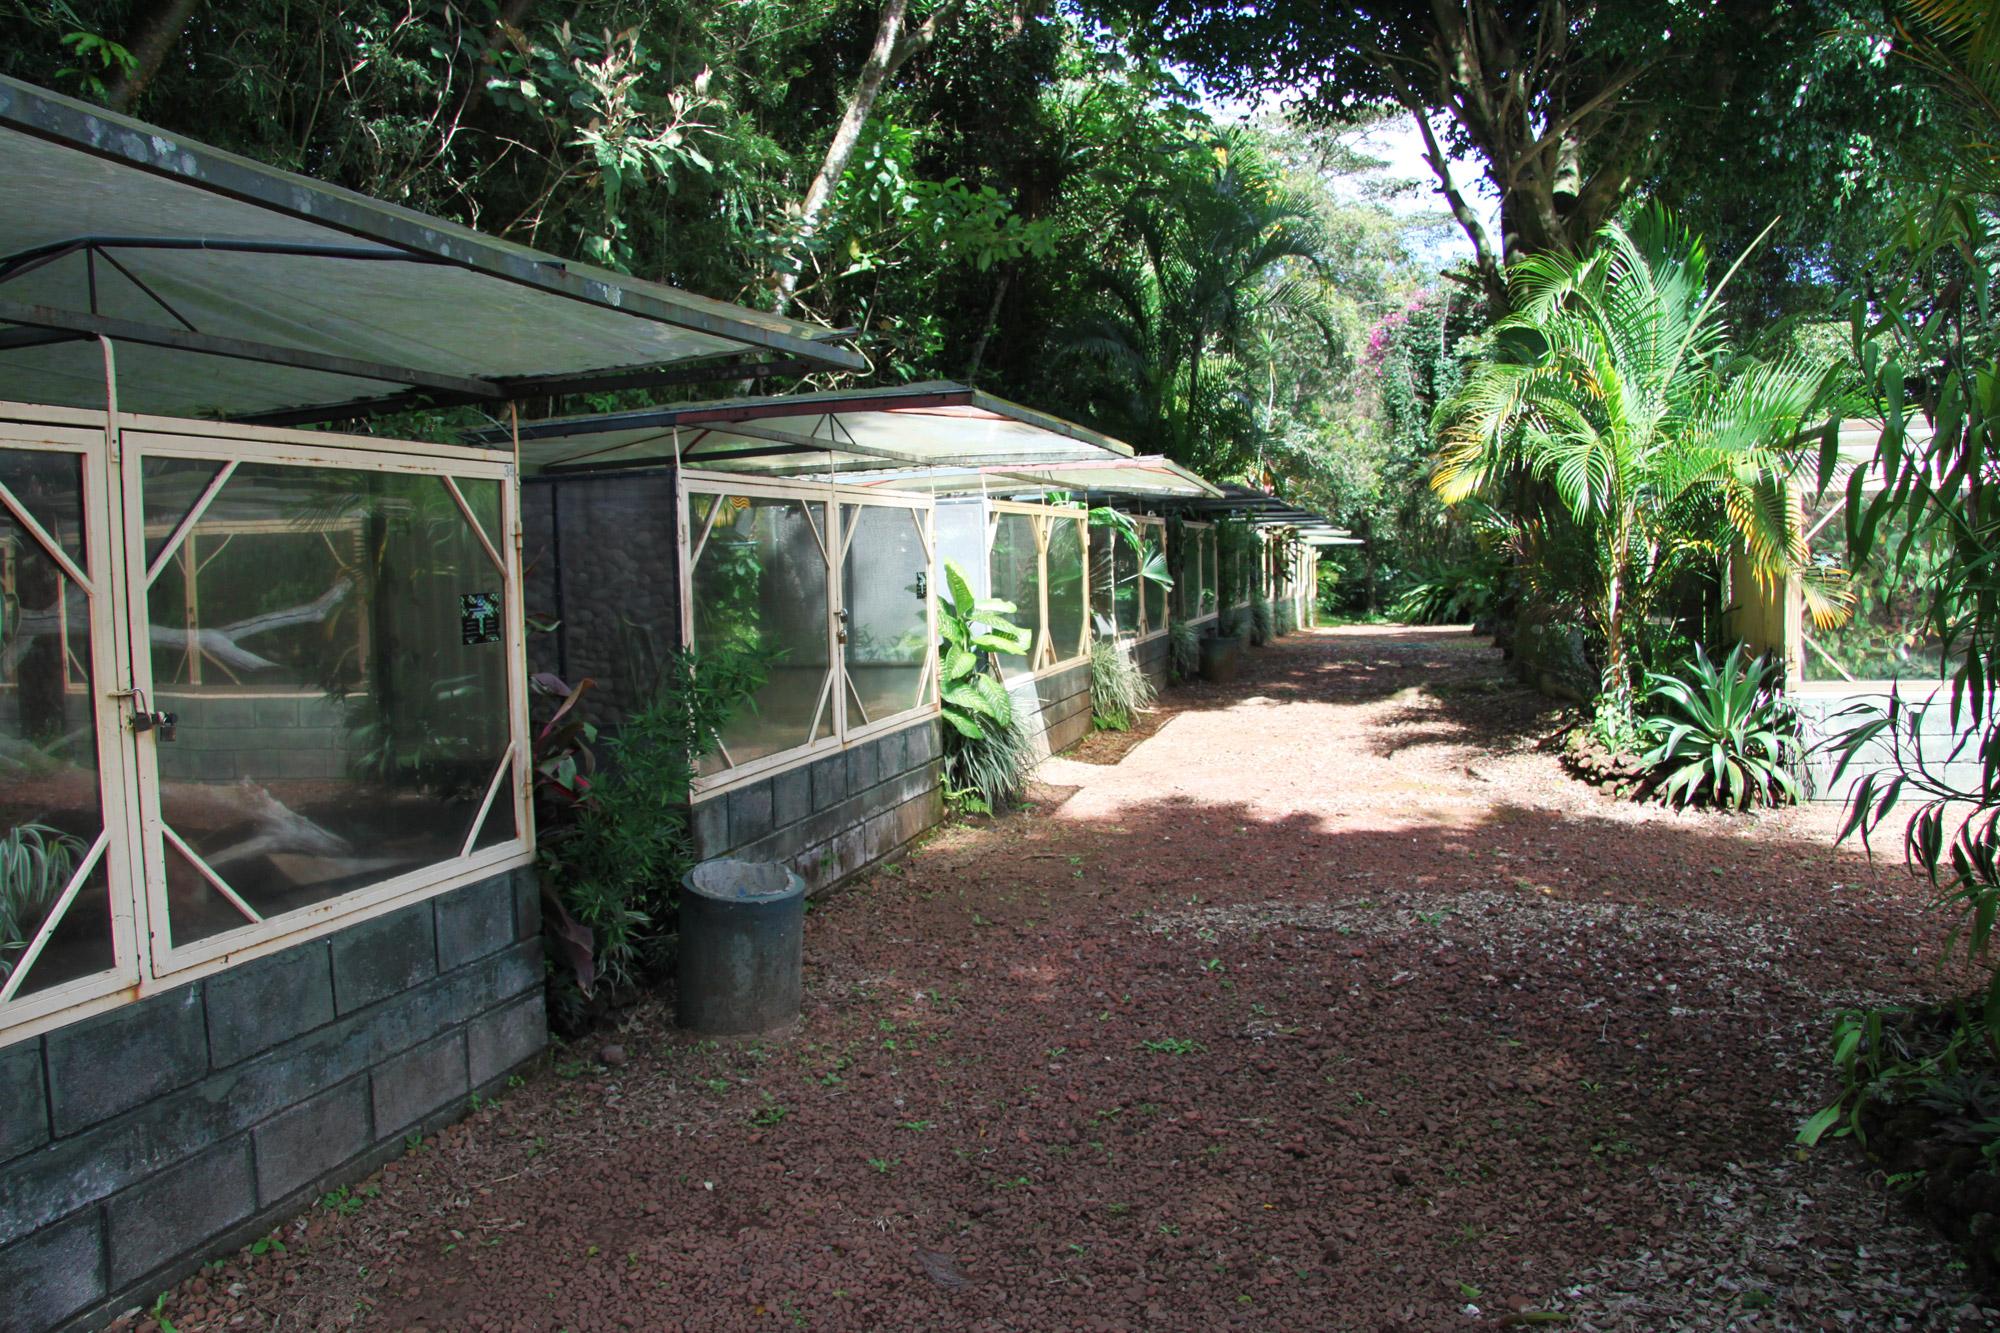 Costa Rica 2014 - dag 7 - World of Snakes